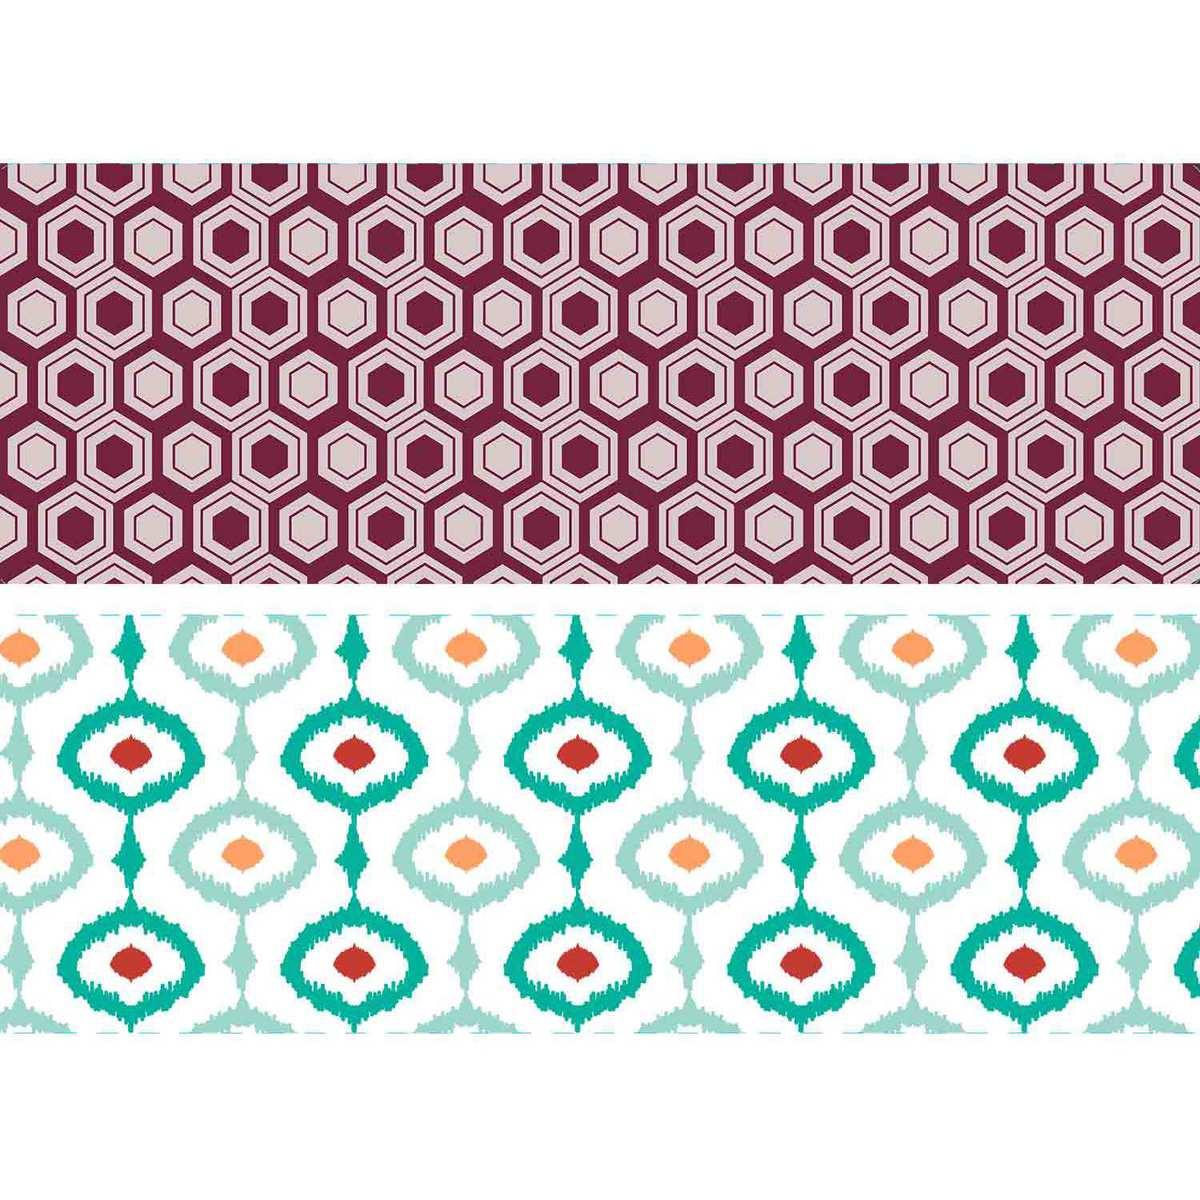 Wrap & Serve™ Slow Cooker Wraps: Trendy Prints (33706)